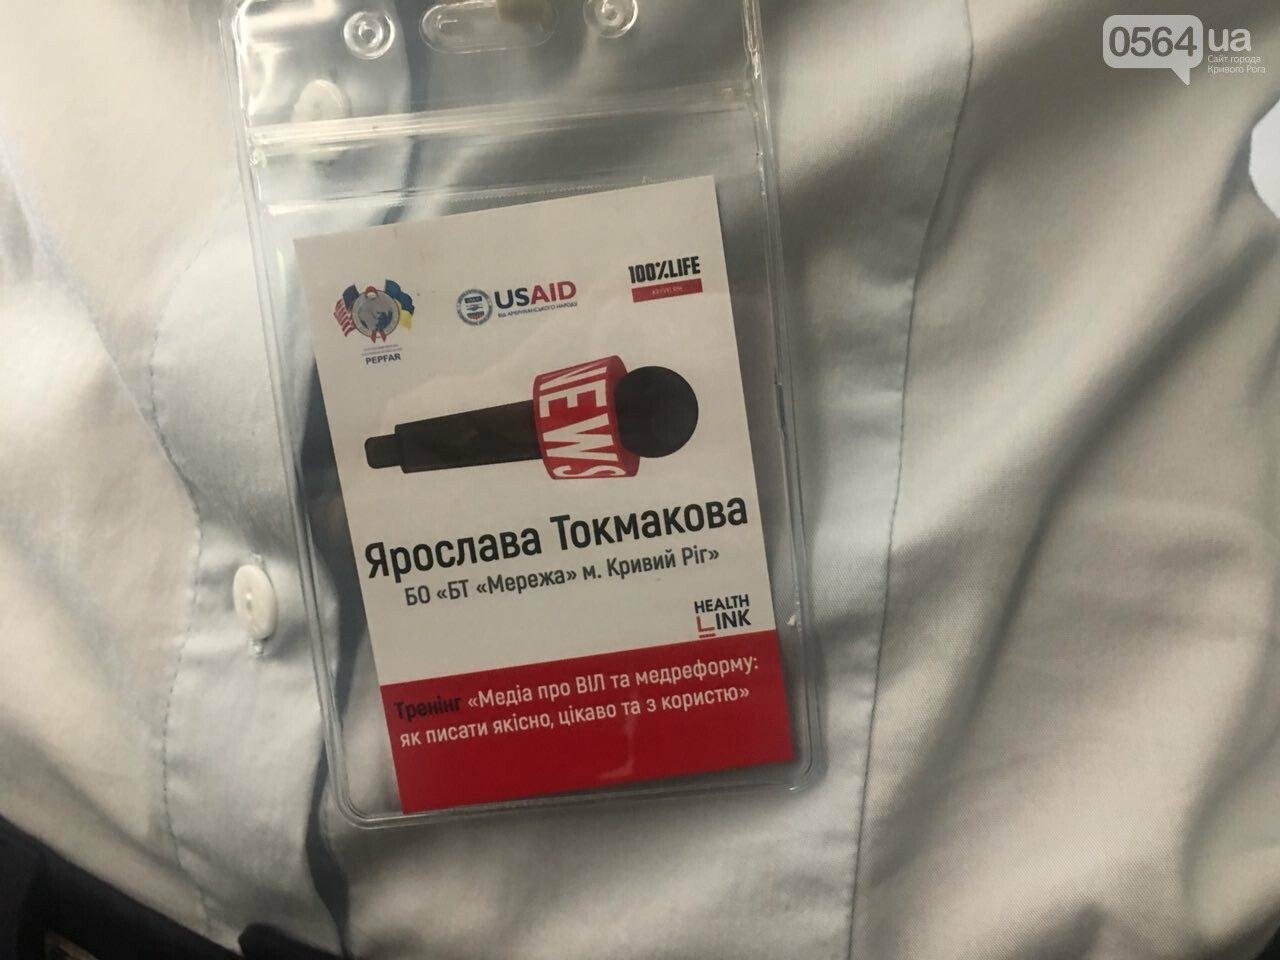 На тренинге о ВИЧ и медреформе криворожским журналистам рассказали о дискриминации и стереотипах, - ФОТО , фото-2